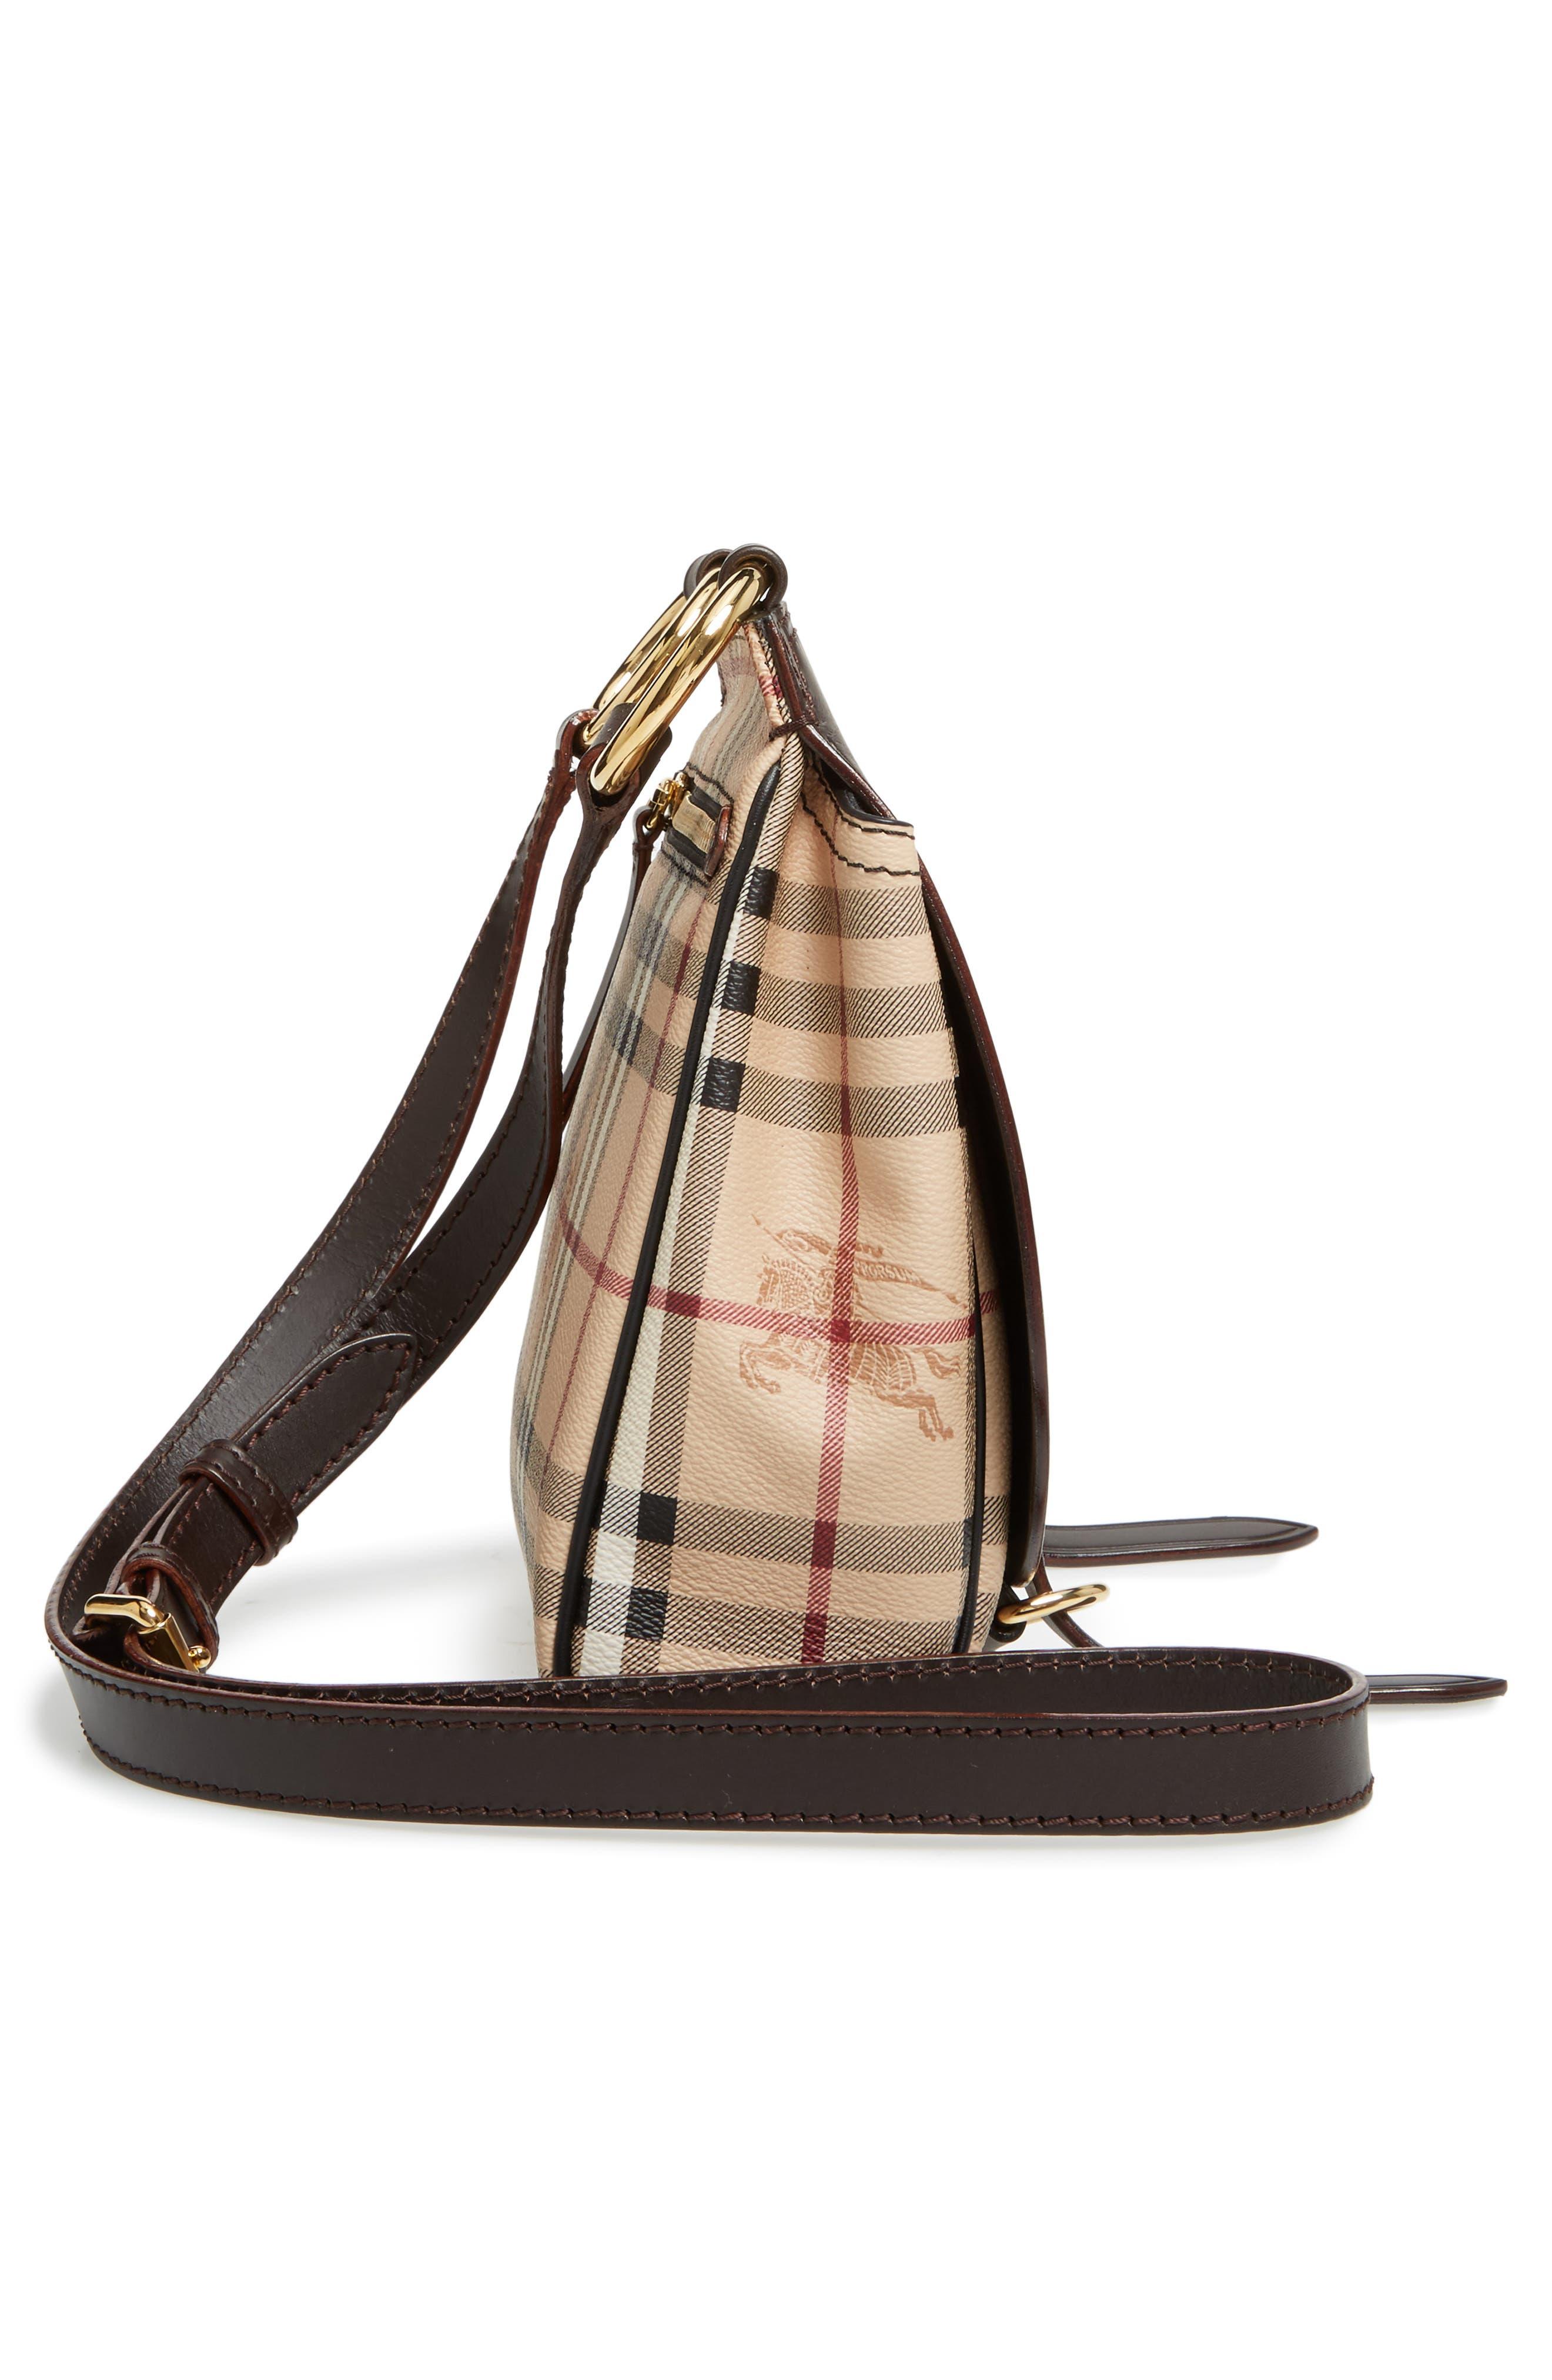 Bridle Leather & Check Shoulder Bag,                             Alternate thumbnail 5, color,                             208